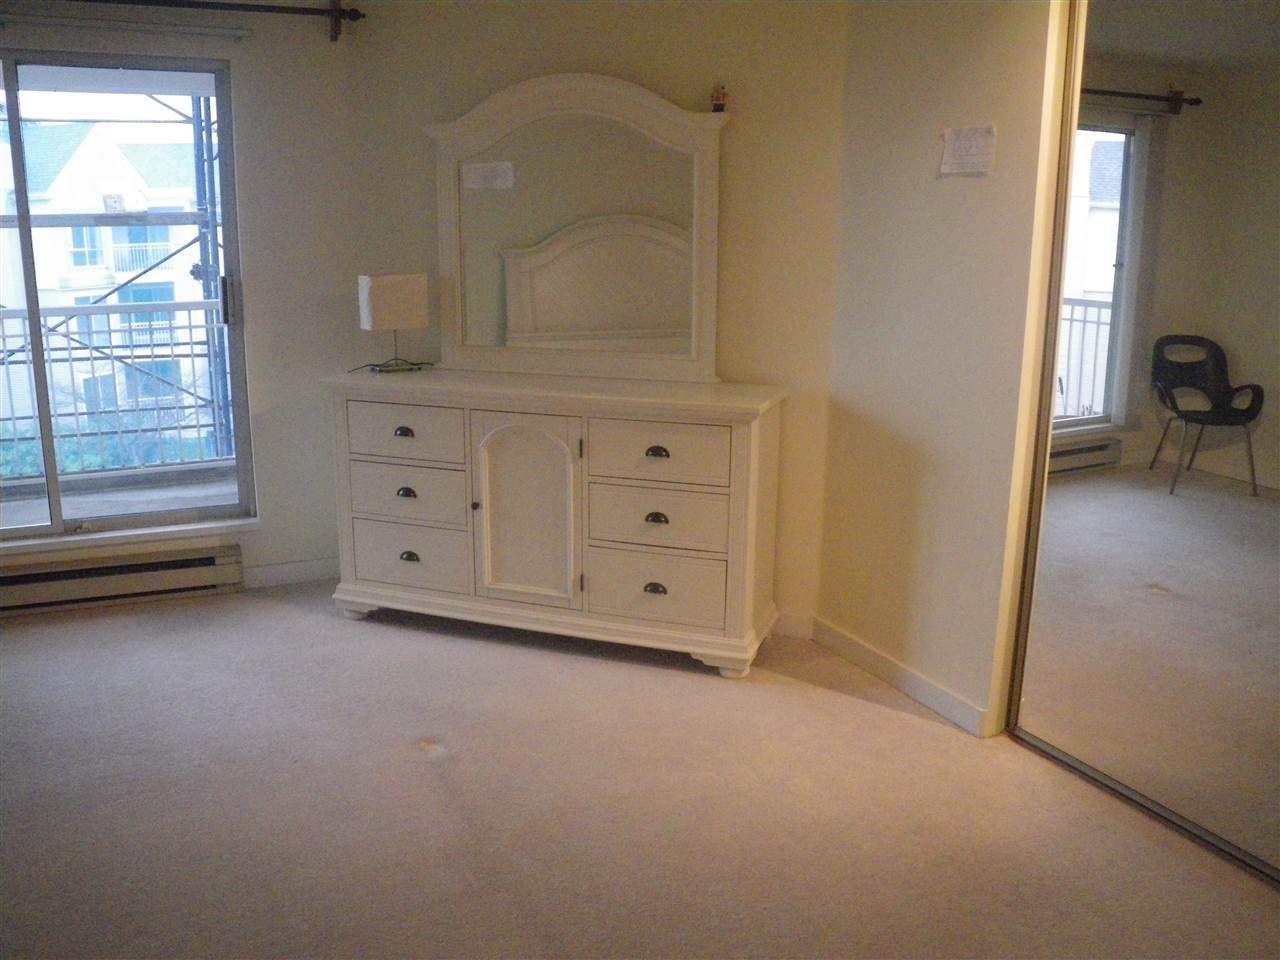 "Photo 10: Photos: 330 7439 MOFFATT Road in Richmond: Brighouse South Condo for sale in ""COLONY BAY NORTH"" : MLS®# R2524541"